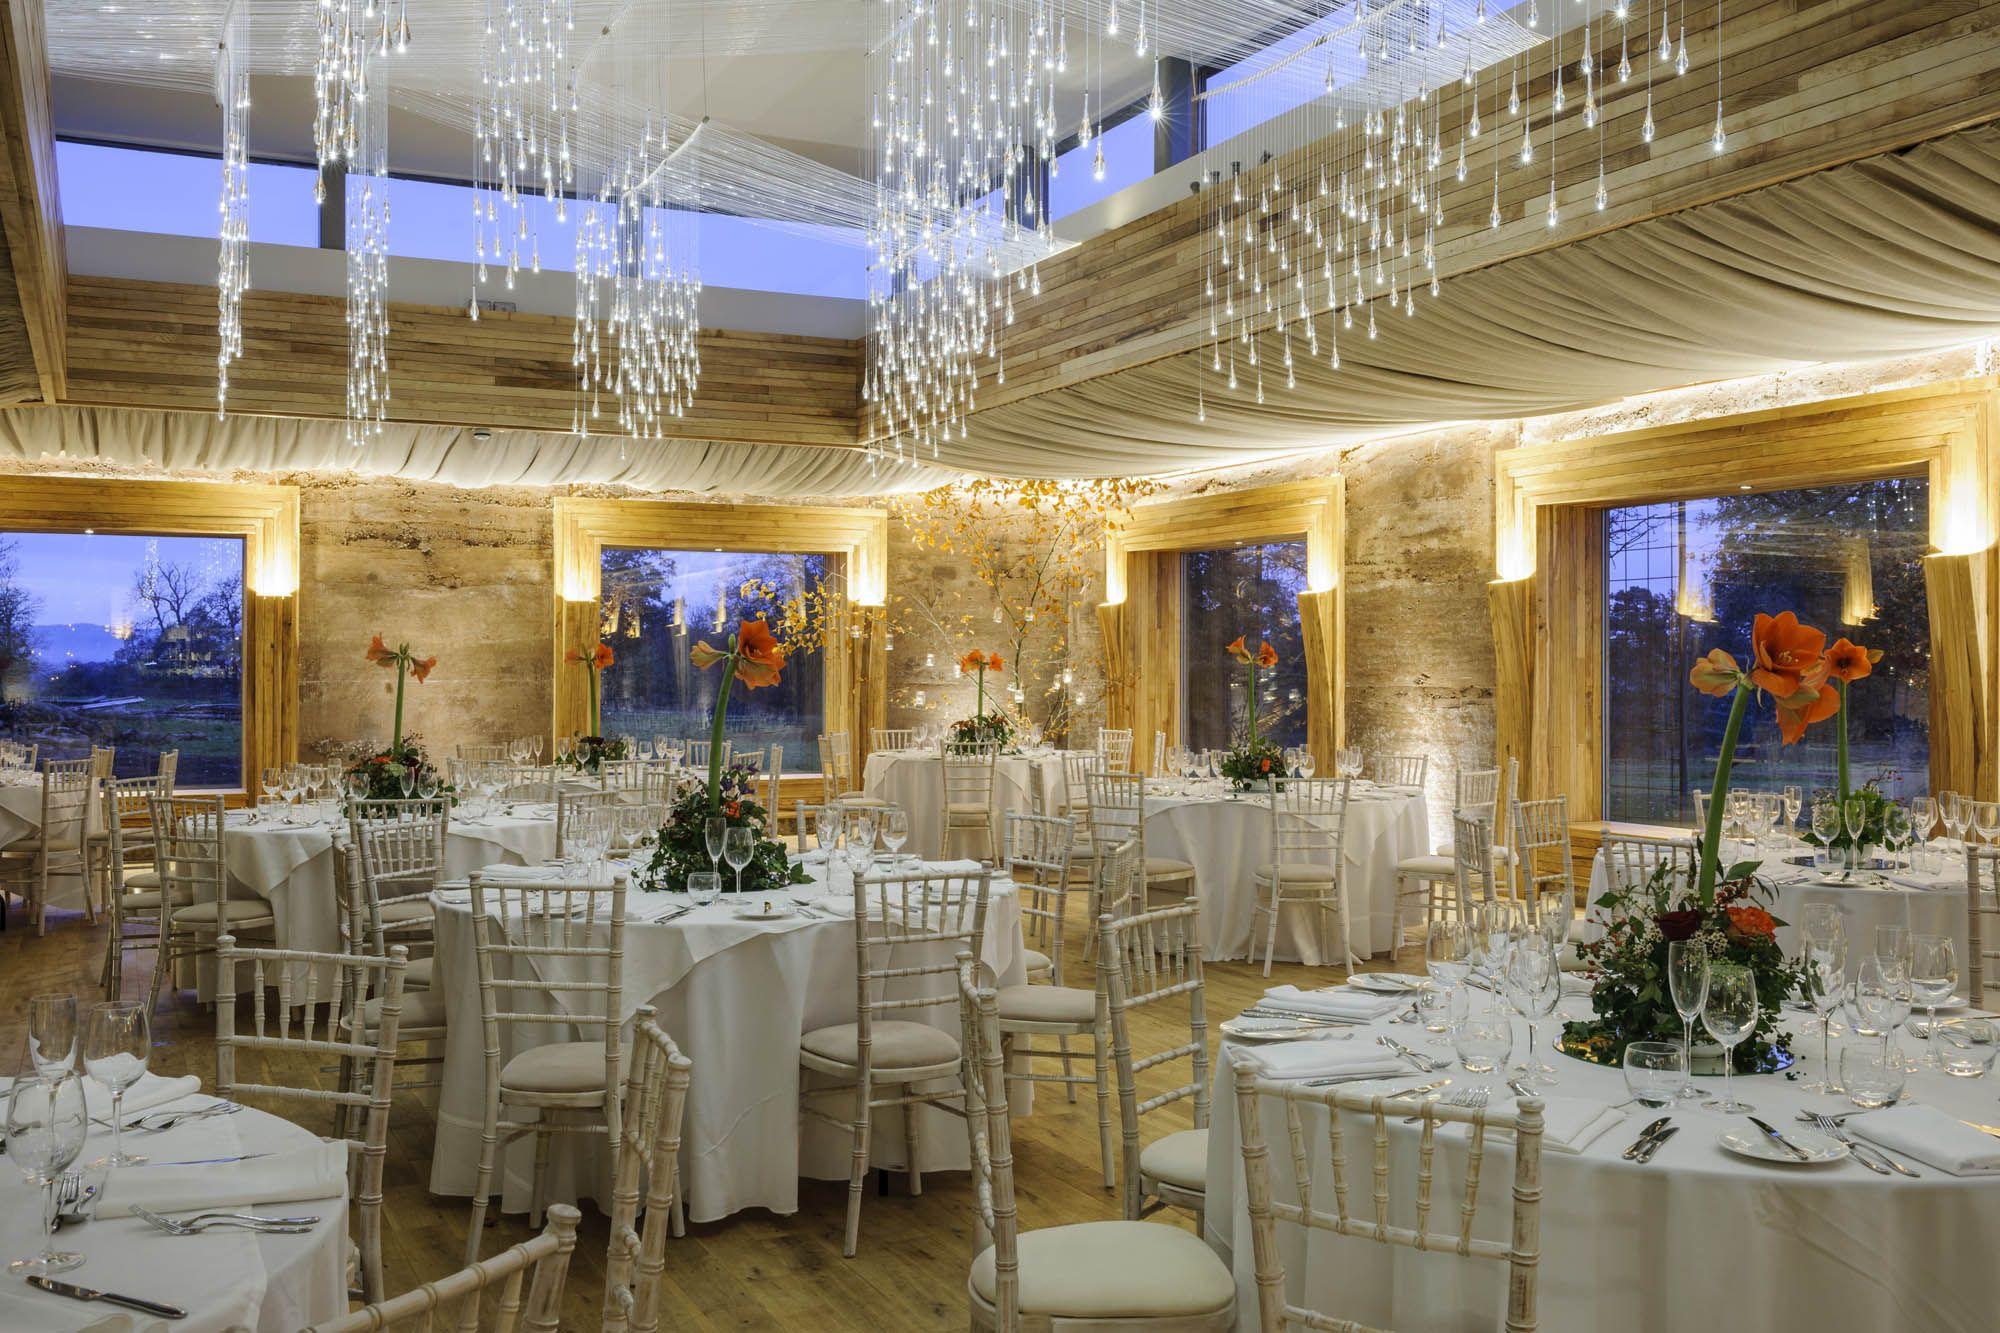 Award Winning Wedding Venue Wedding reception venues